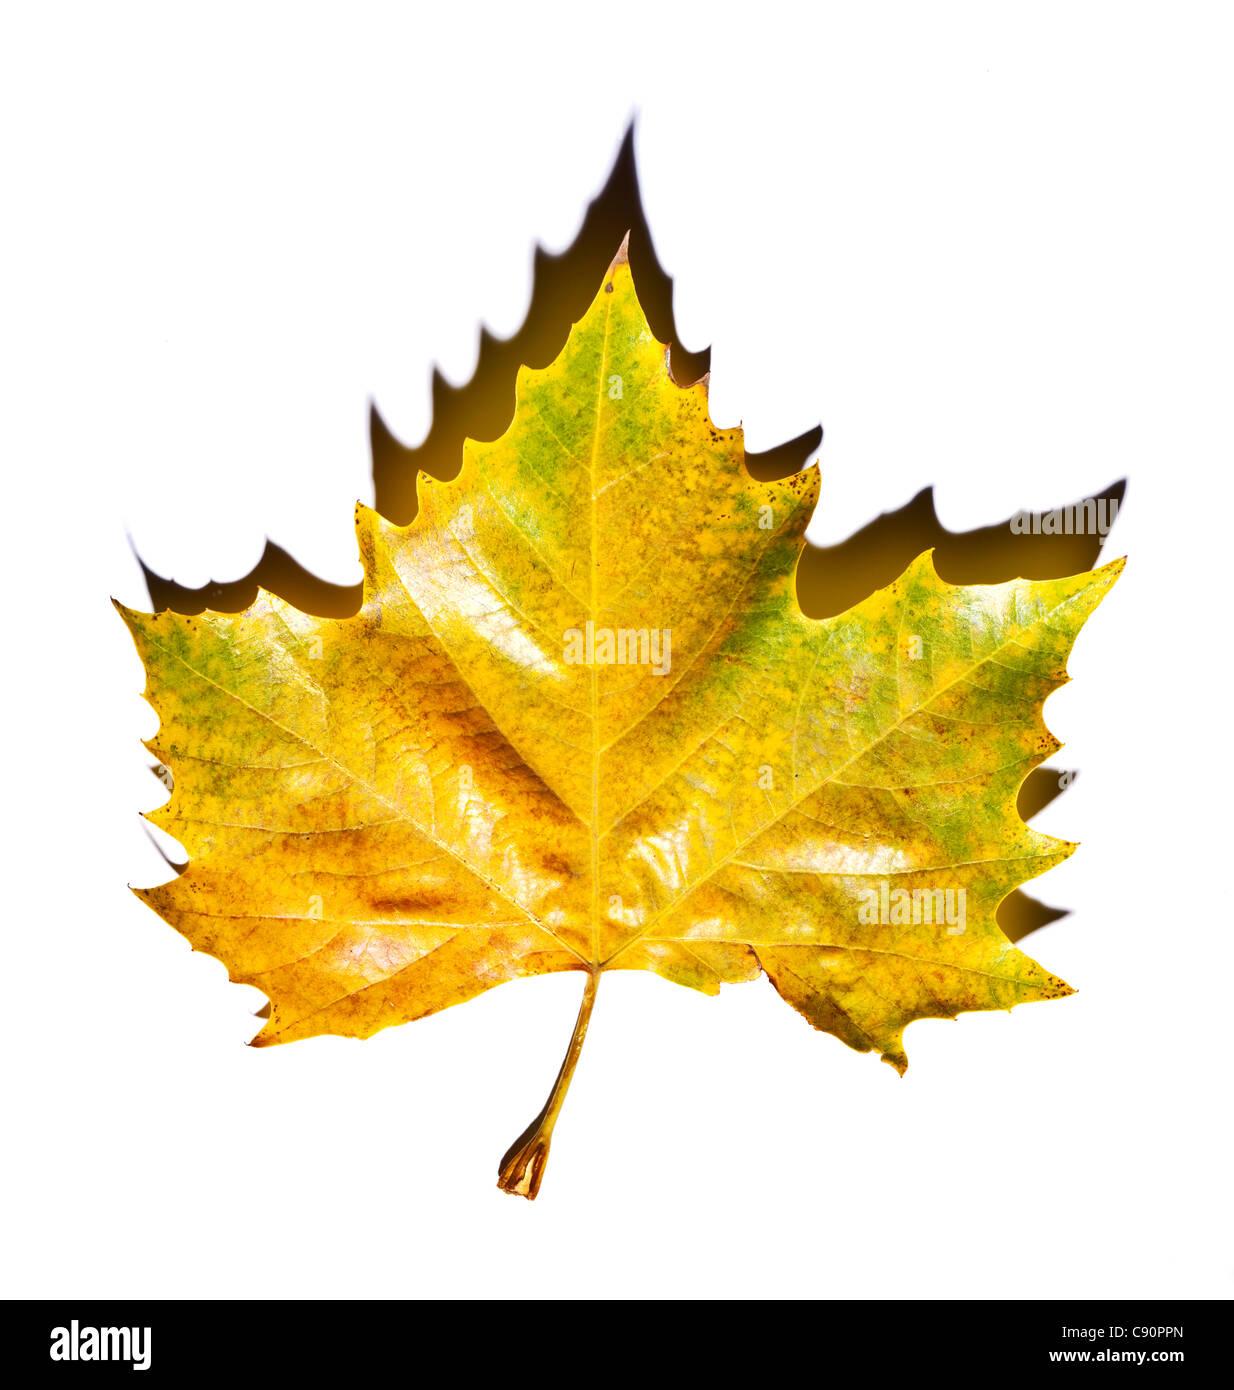 Yellow leaf, studio shot - Stock Image